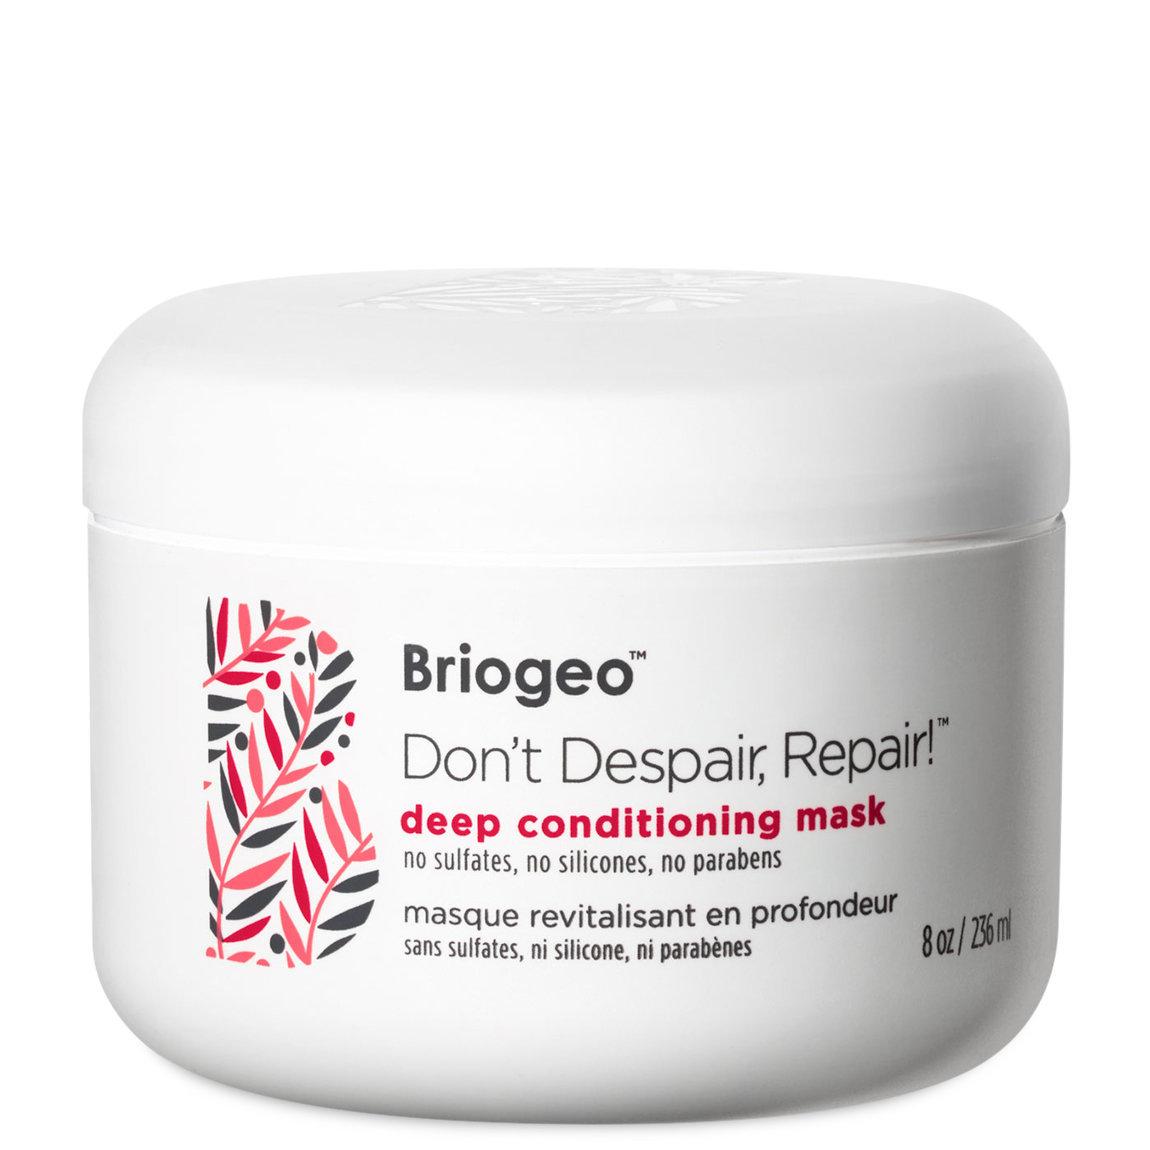 Briogeo Don't Despair, Repair! Deep Conditioning Mask 8 oz alternative view 1 - product swatch.